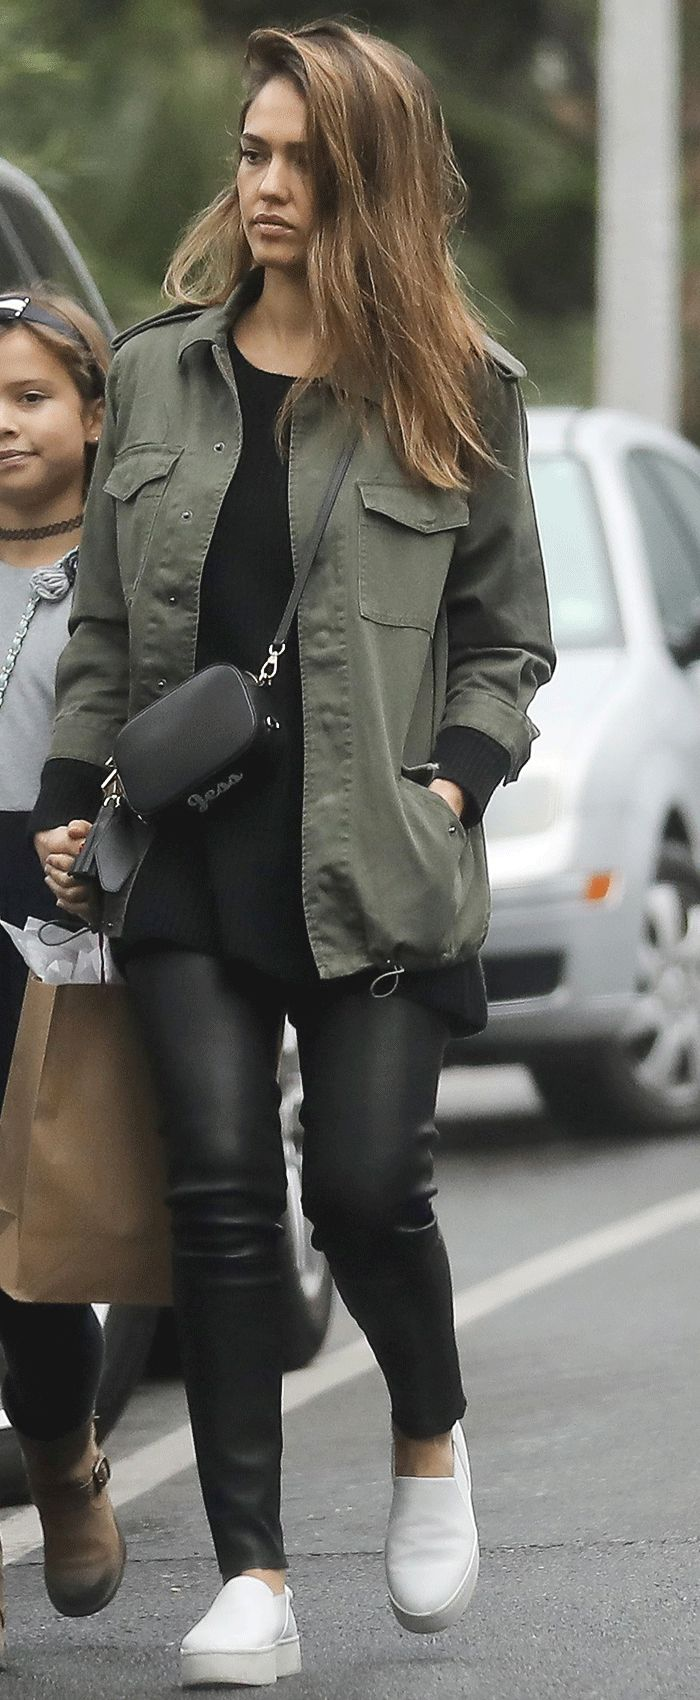 Jessica Alba's Stylish $40 Jacket Is Still Available via @WhoWhatWear